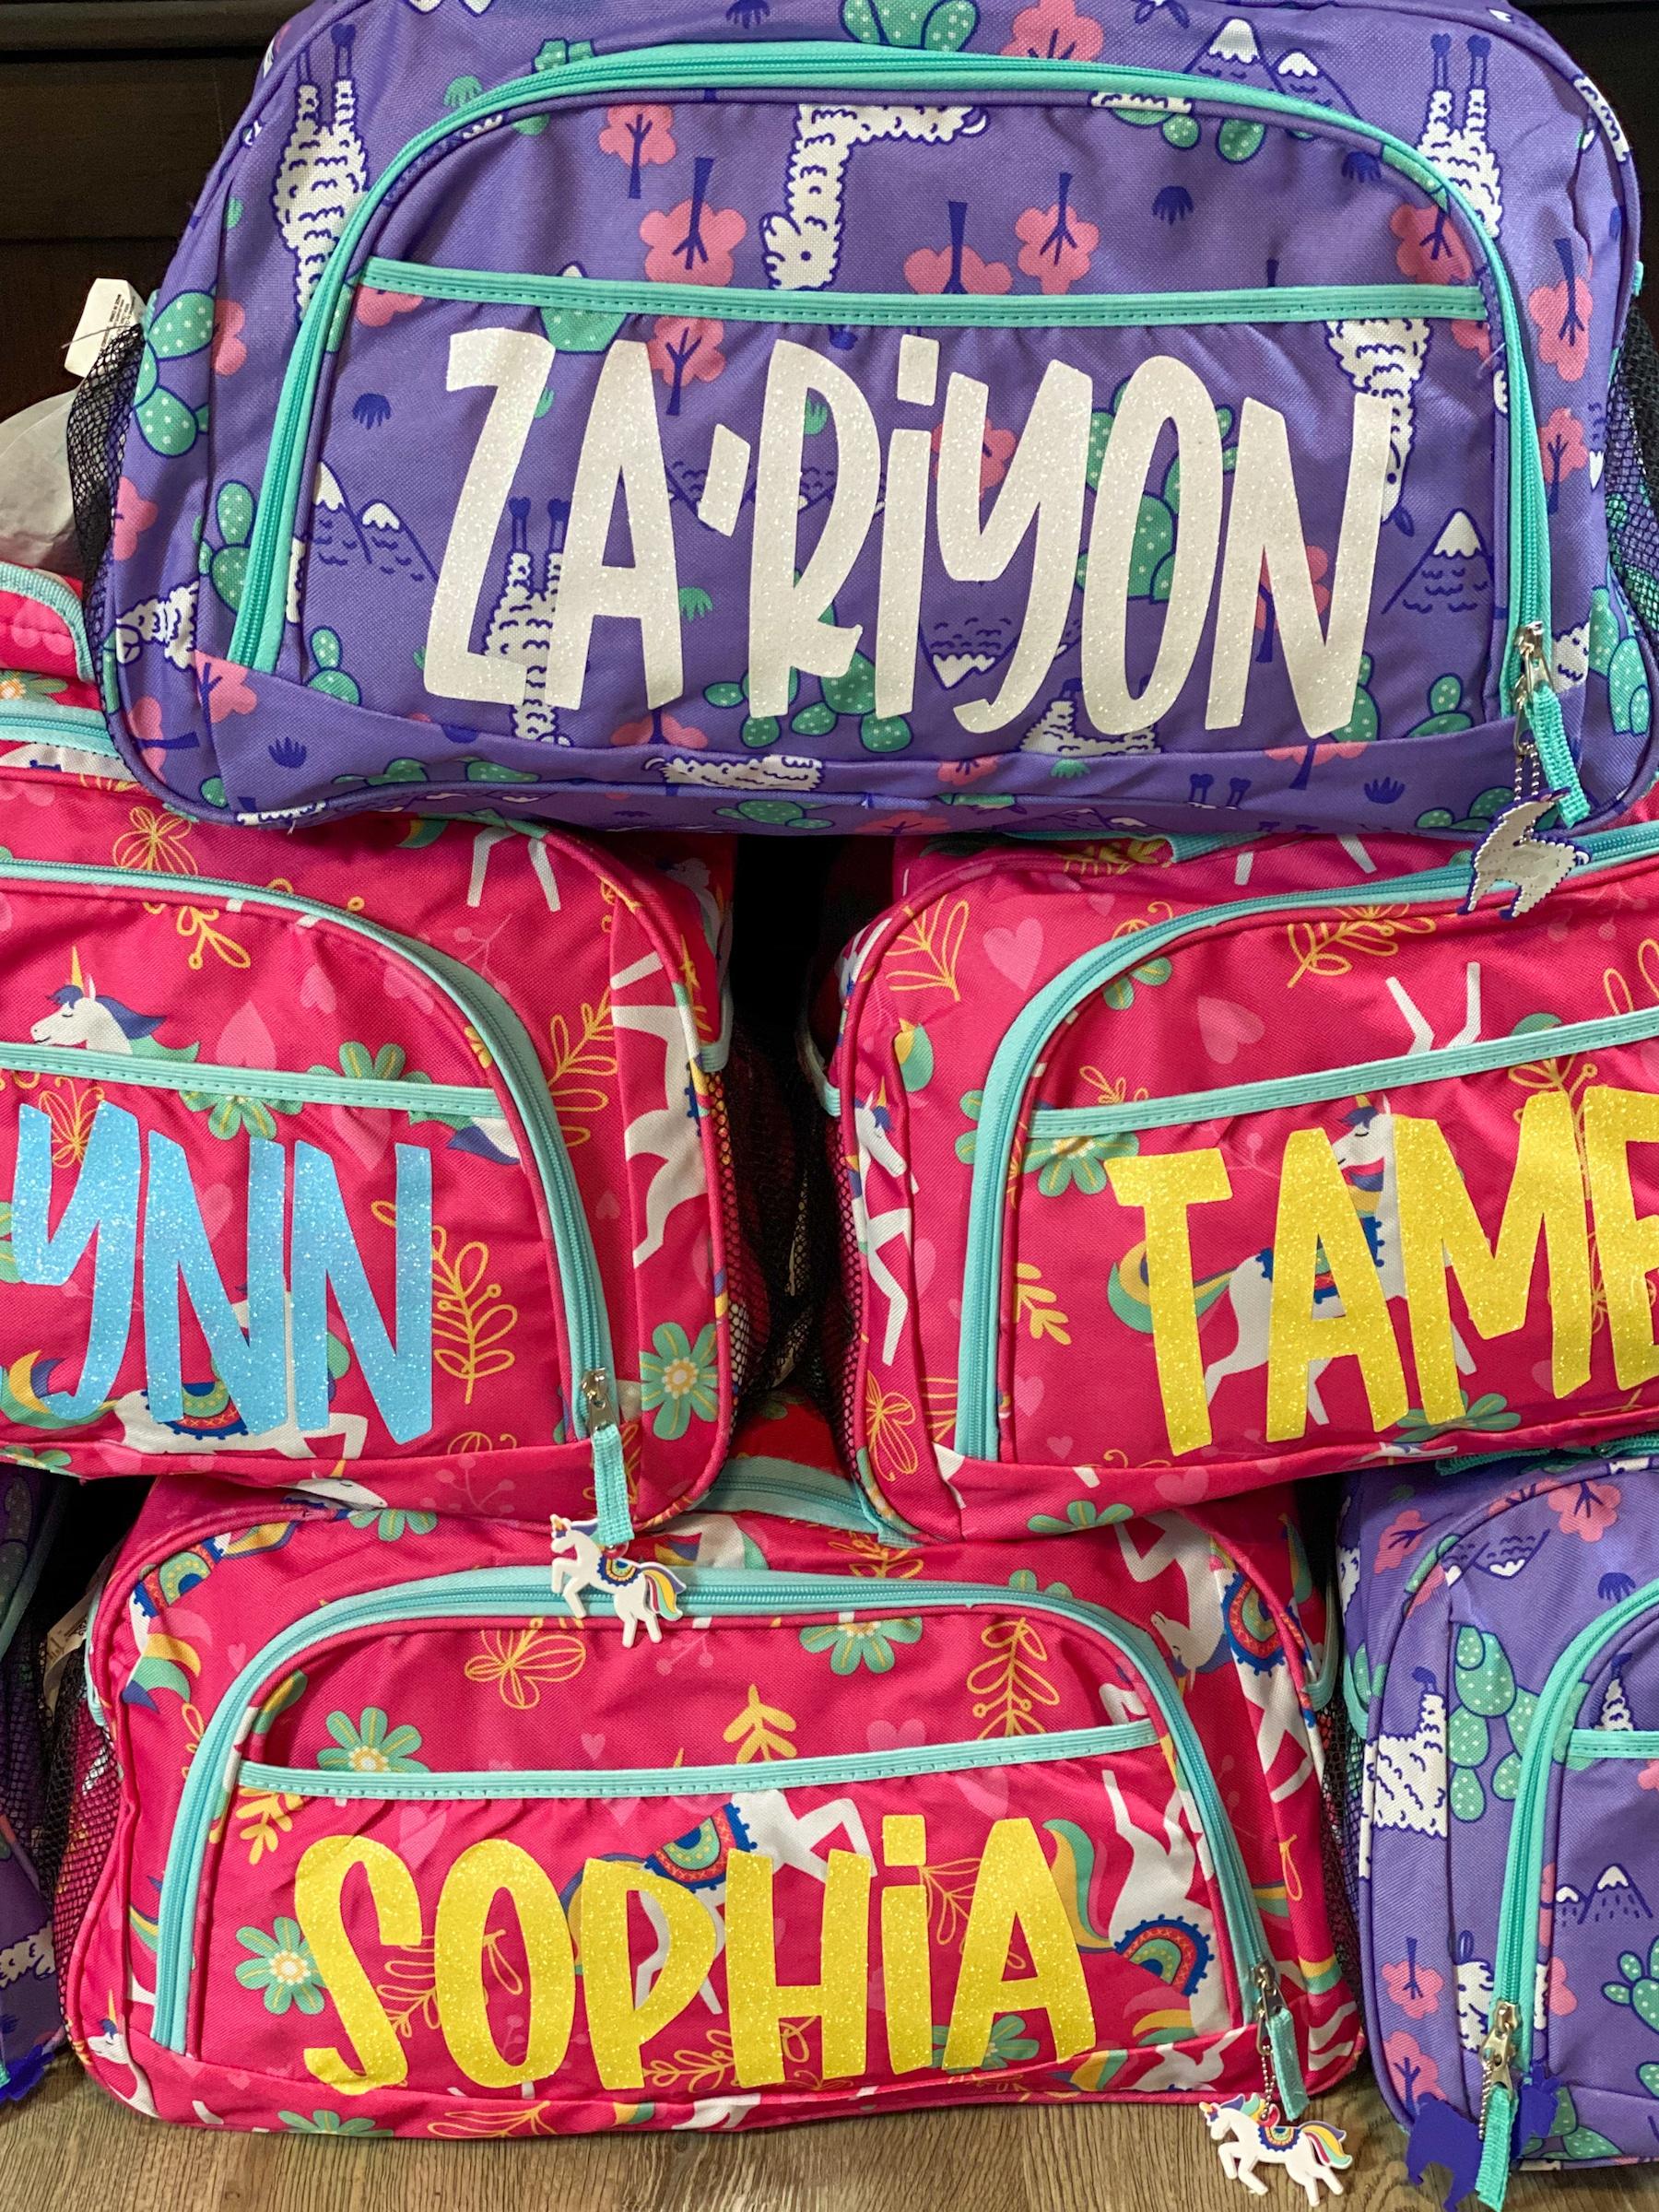 cricut easypress mini, duffel bag project purple and pink